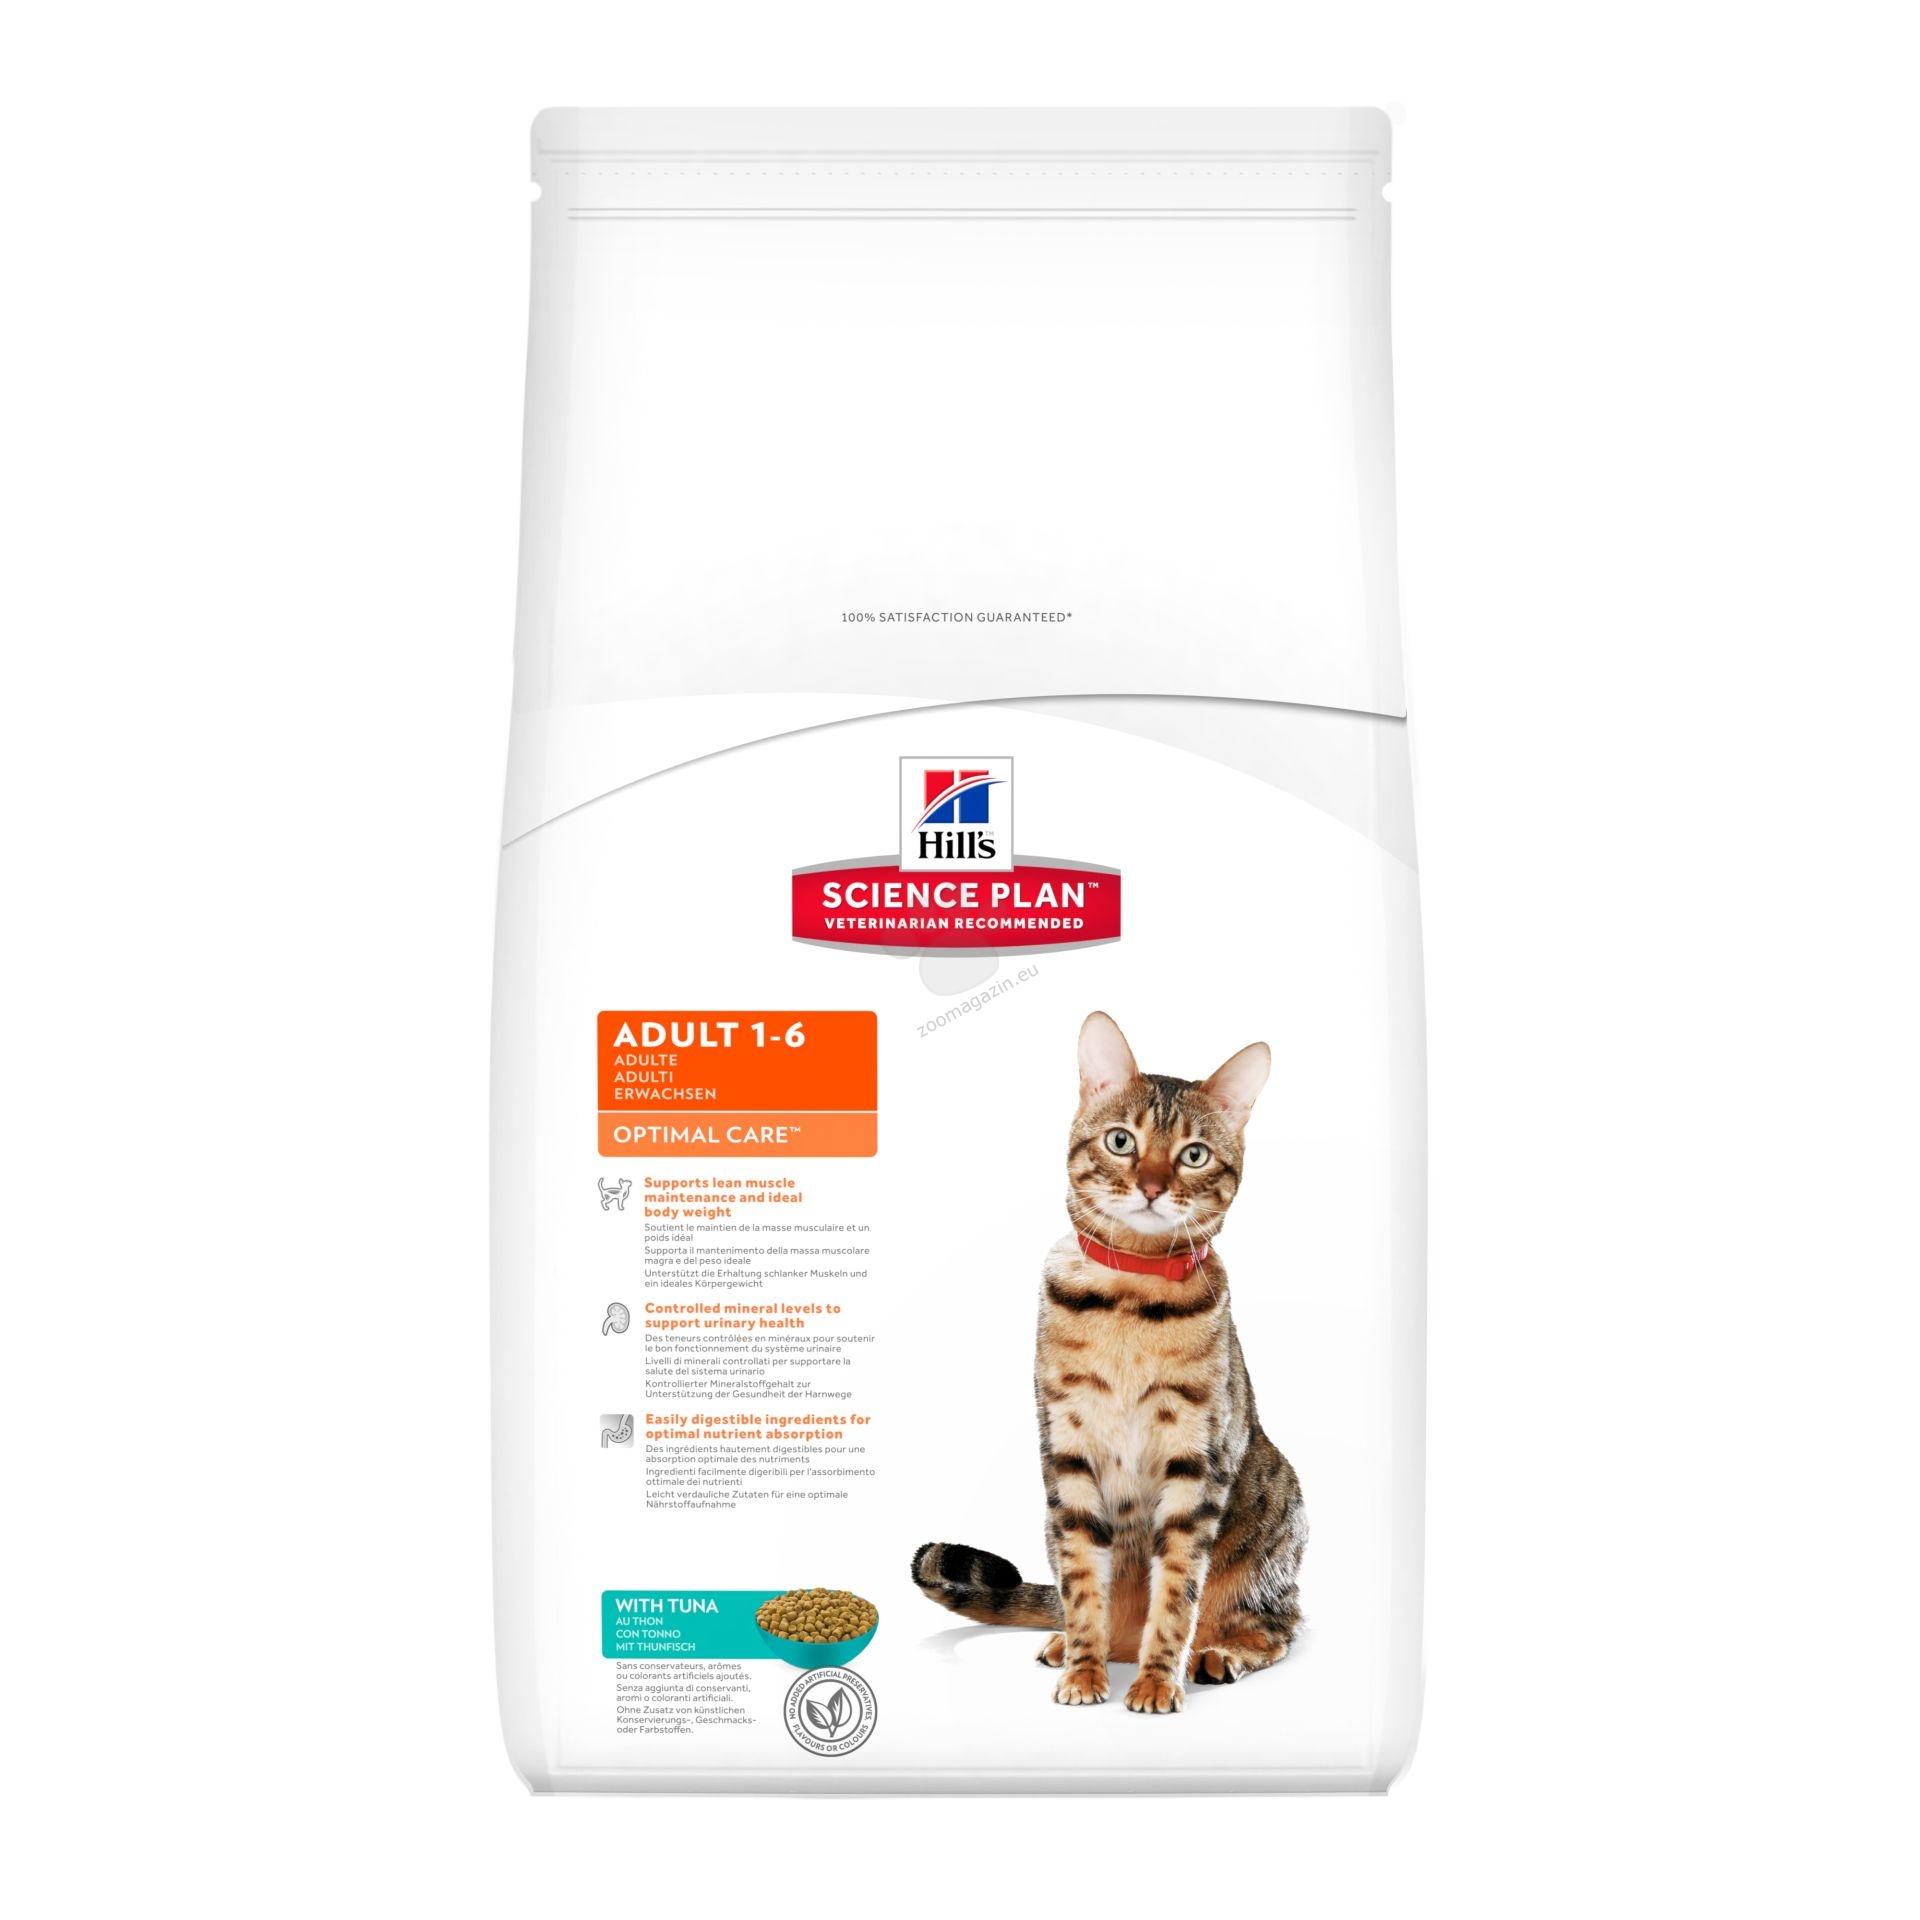 Science Plan Feline Adult Optimal Care Tuna - с риба тон - Котки от 1 до 7 години 10 кг. + ПОДАРЪК: 3 кутии x 12 пауча Adult FAVOURITE SELECTION